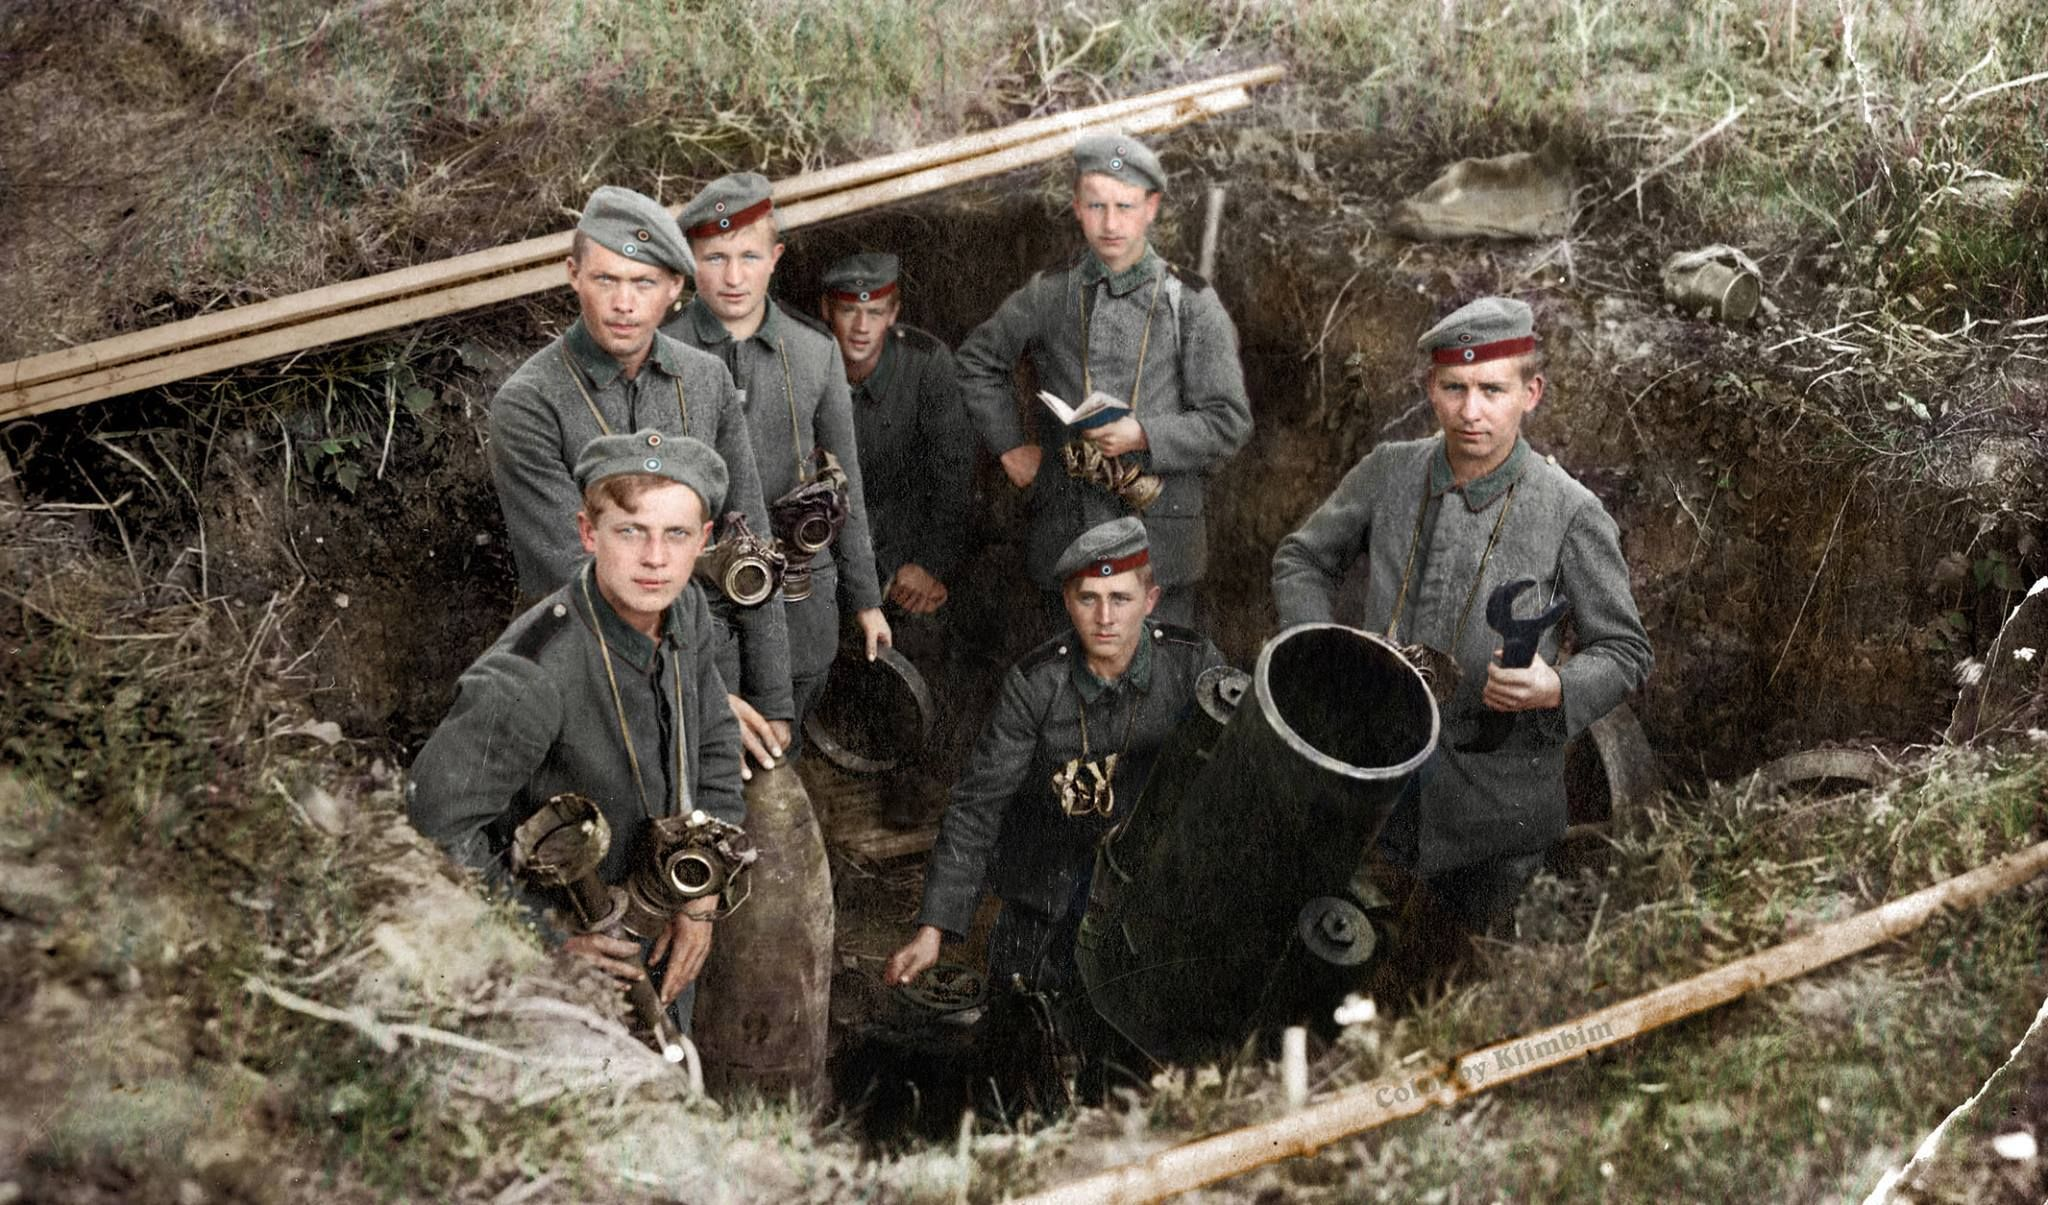 German 25 cm schwerer Minenwerfer (mine-thrower). | History war, World war  one, Colorized photos